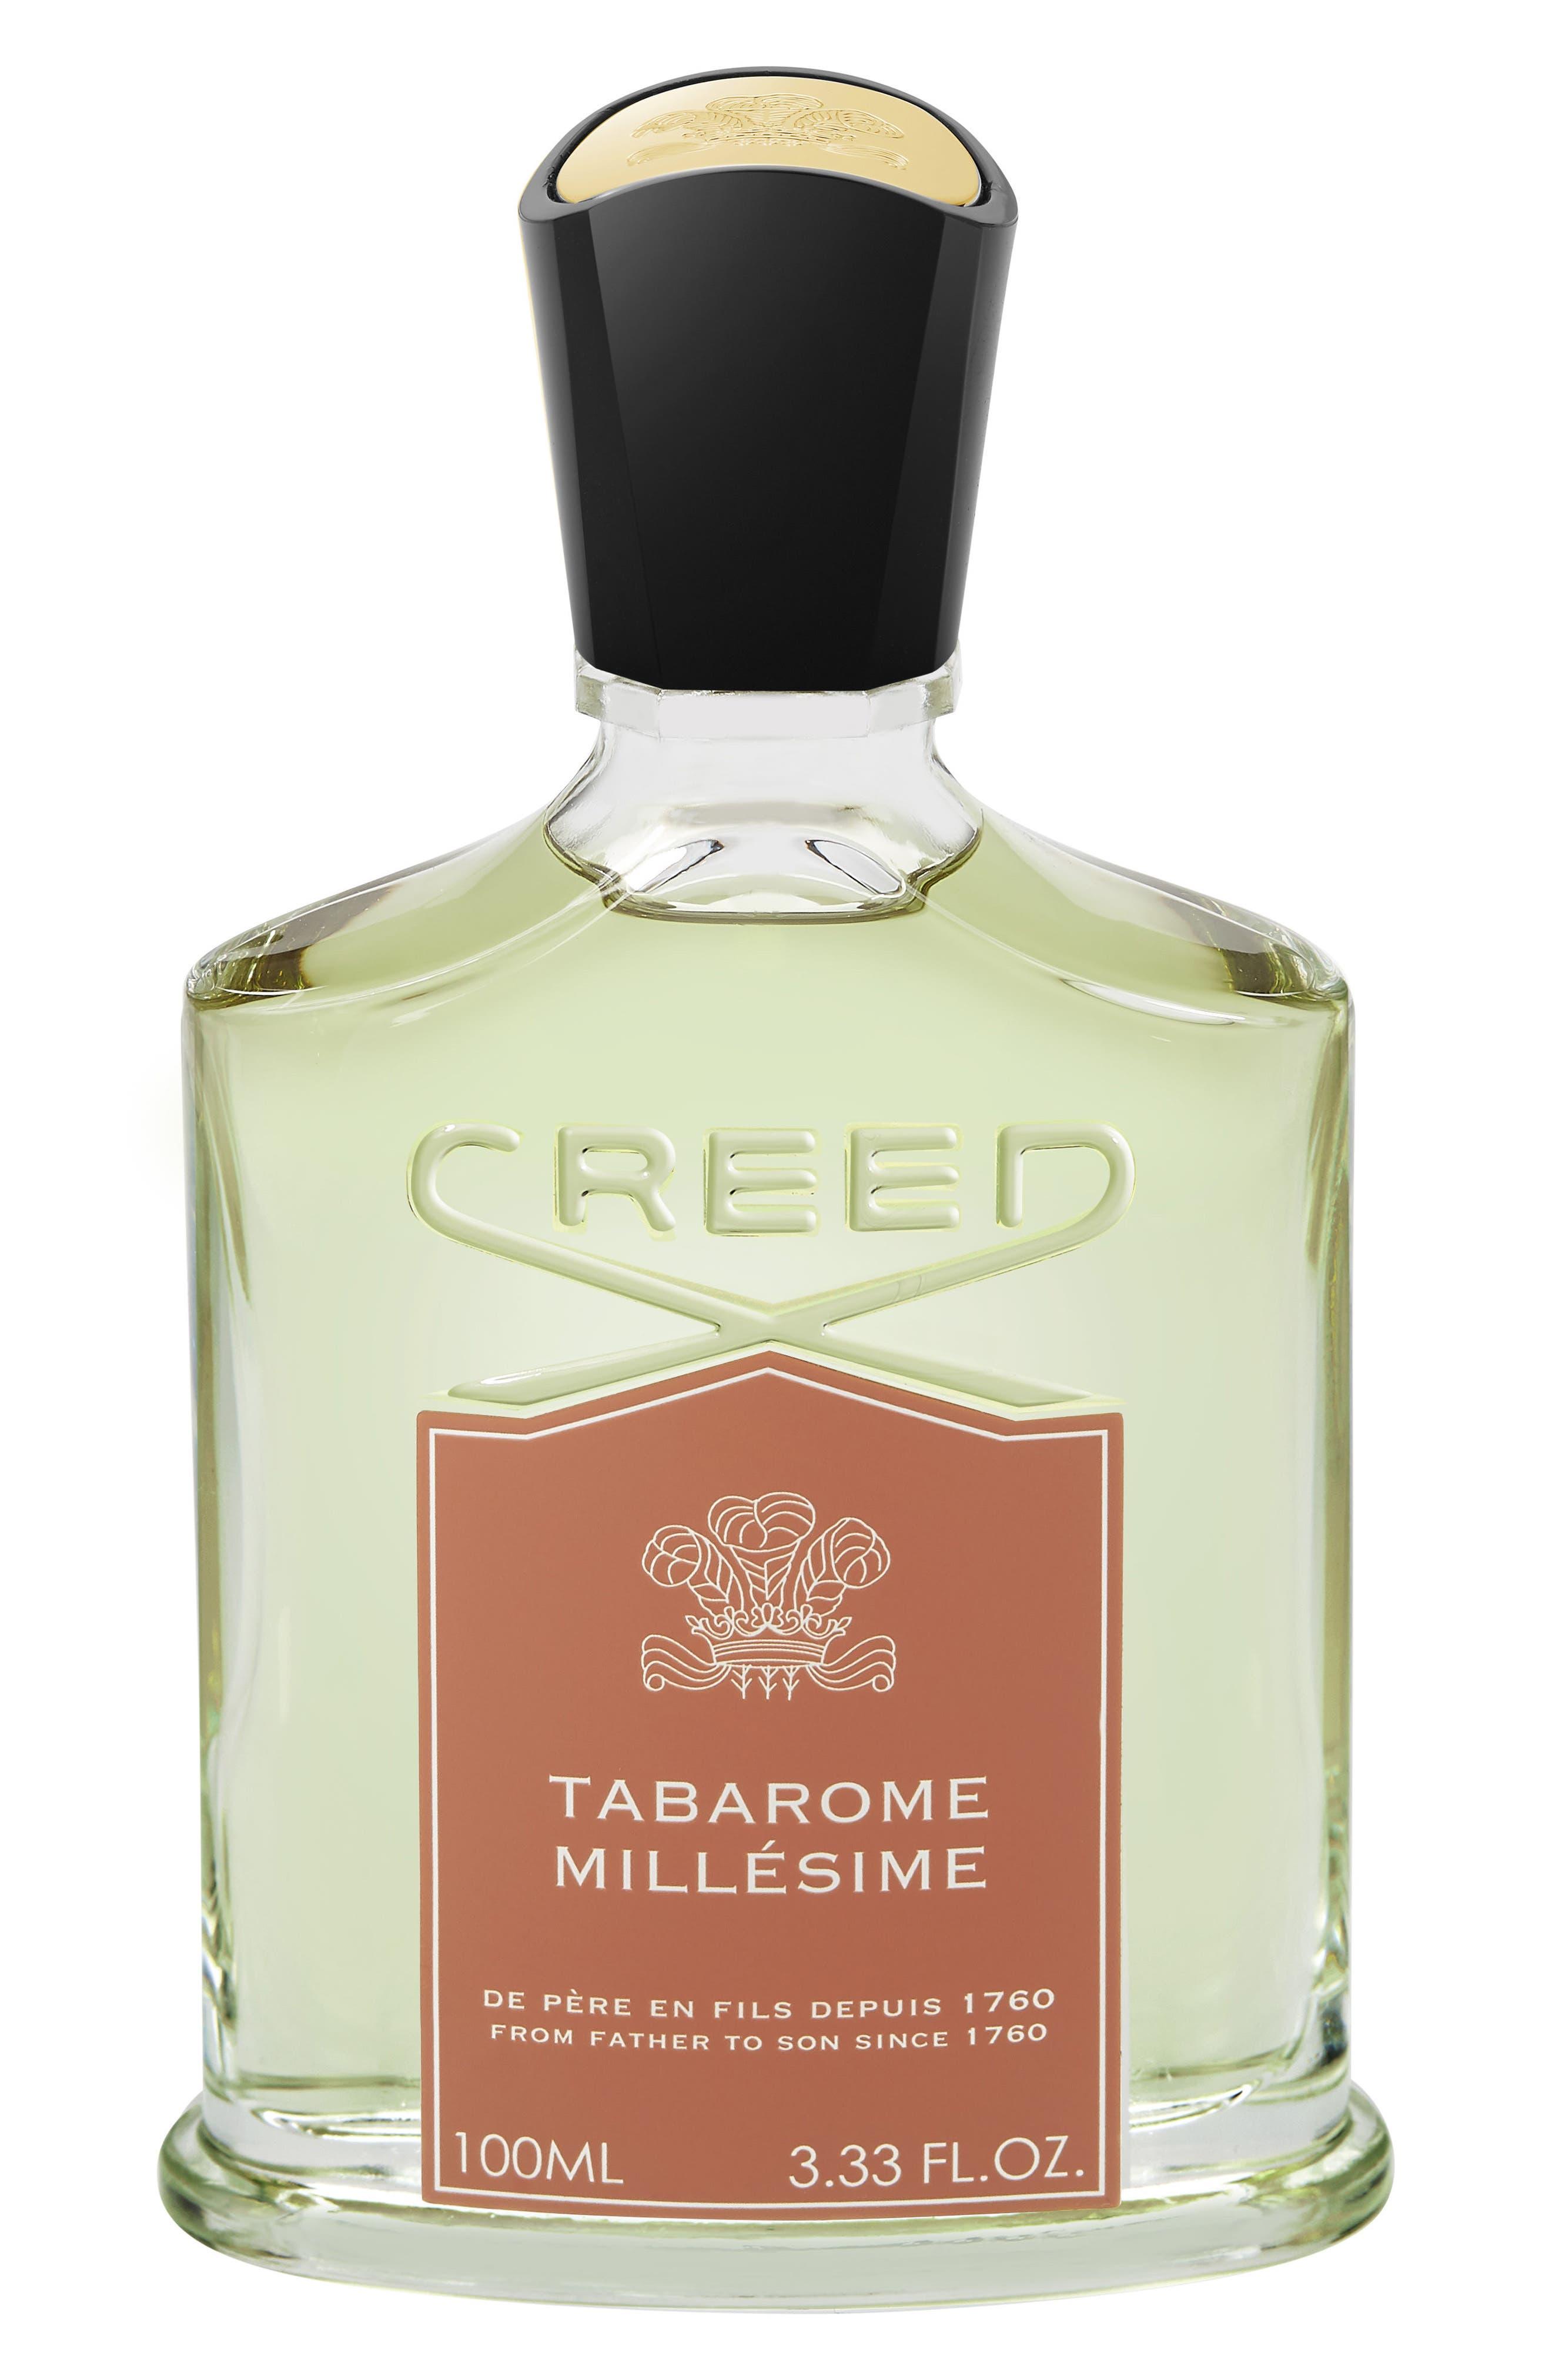 Tabarome Millesime Fragrance